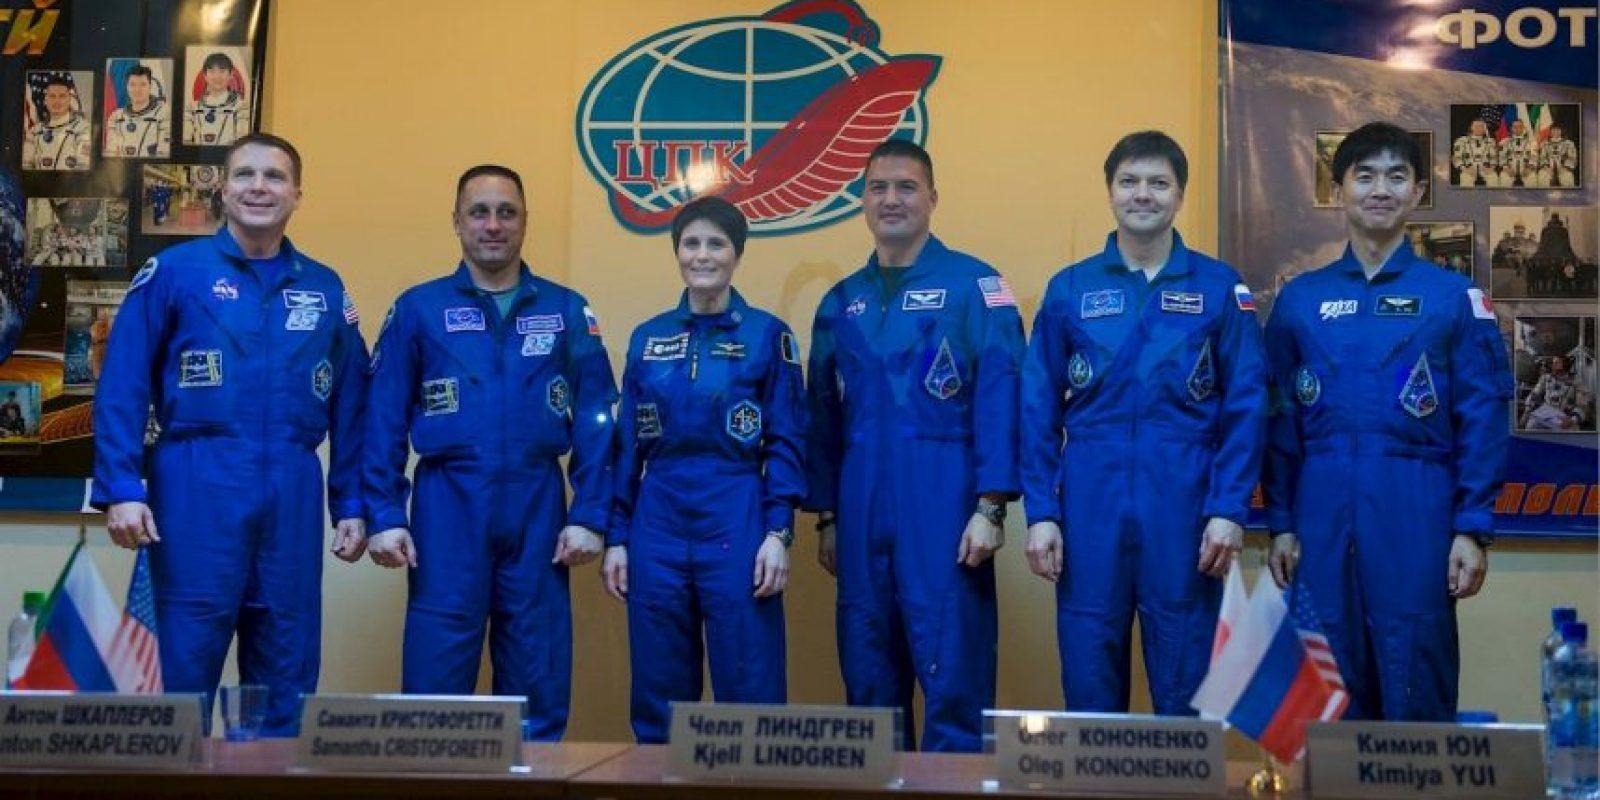 De izquierda a derecha: Terry Virts, Anton Shkaplerov, Samantha Cristoforetti, Kjell Lindgren, Oleg Kononenko, Kimiya Yui Foto:Getty Images